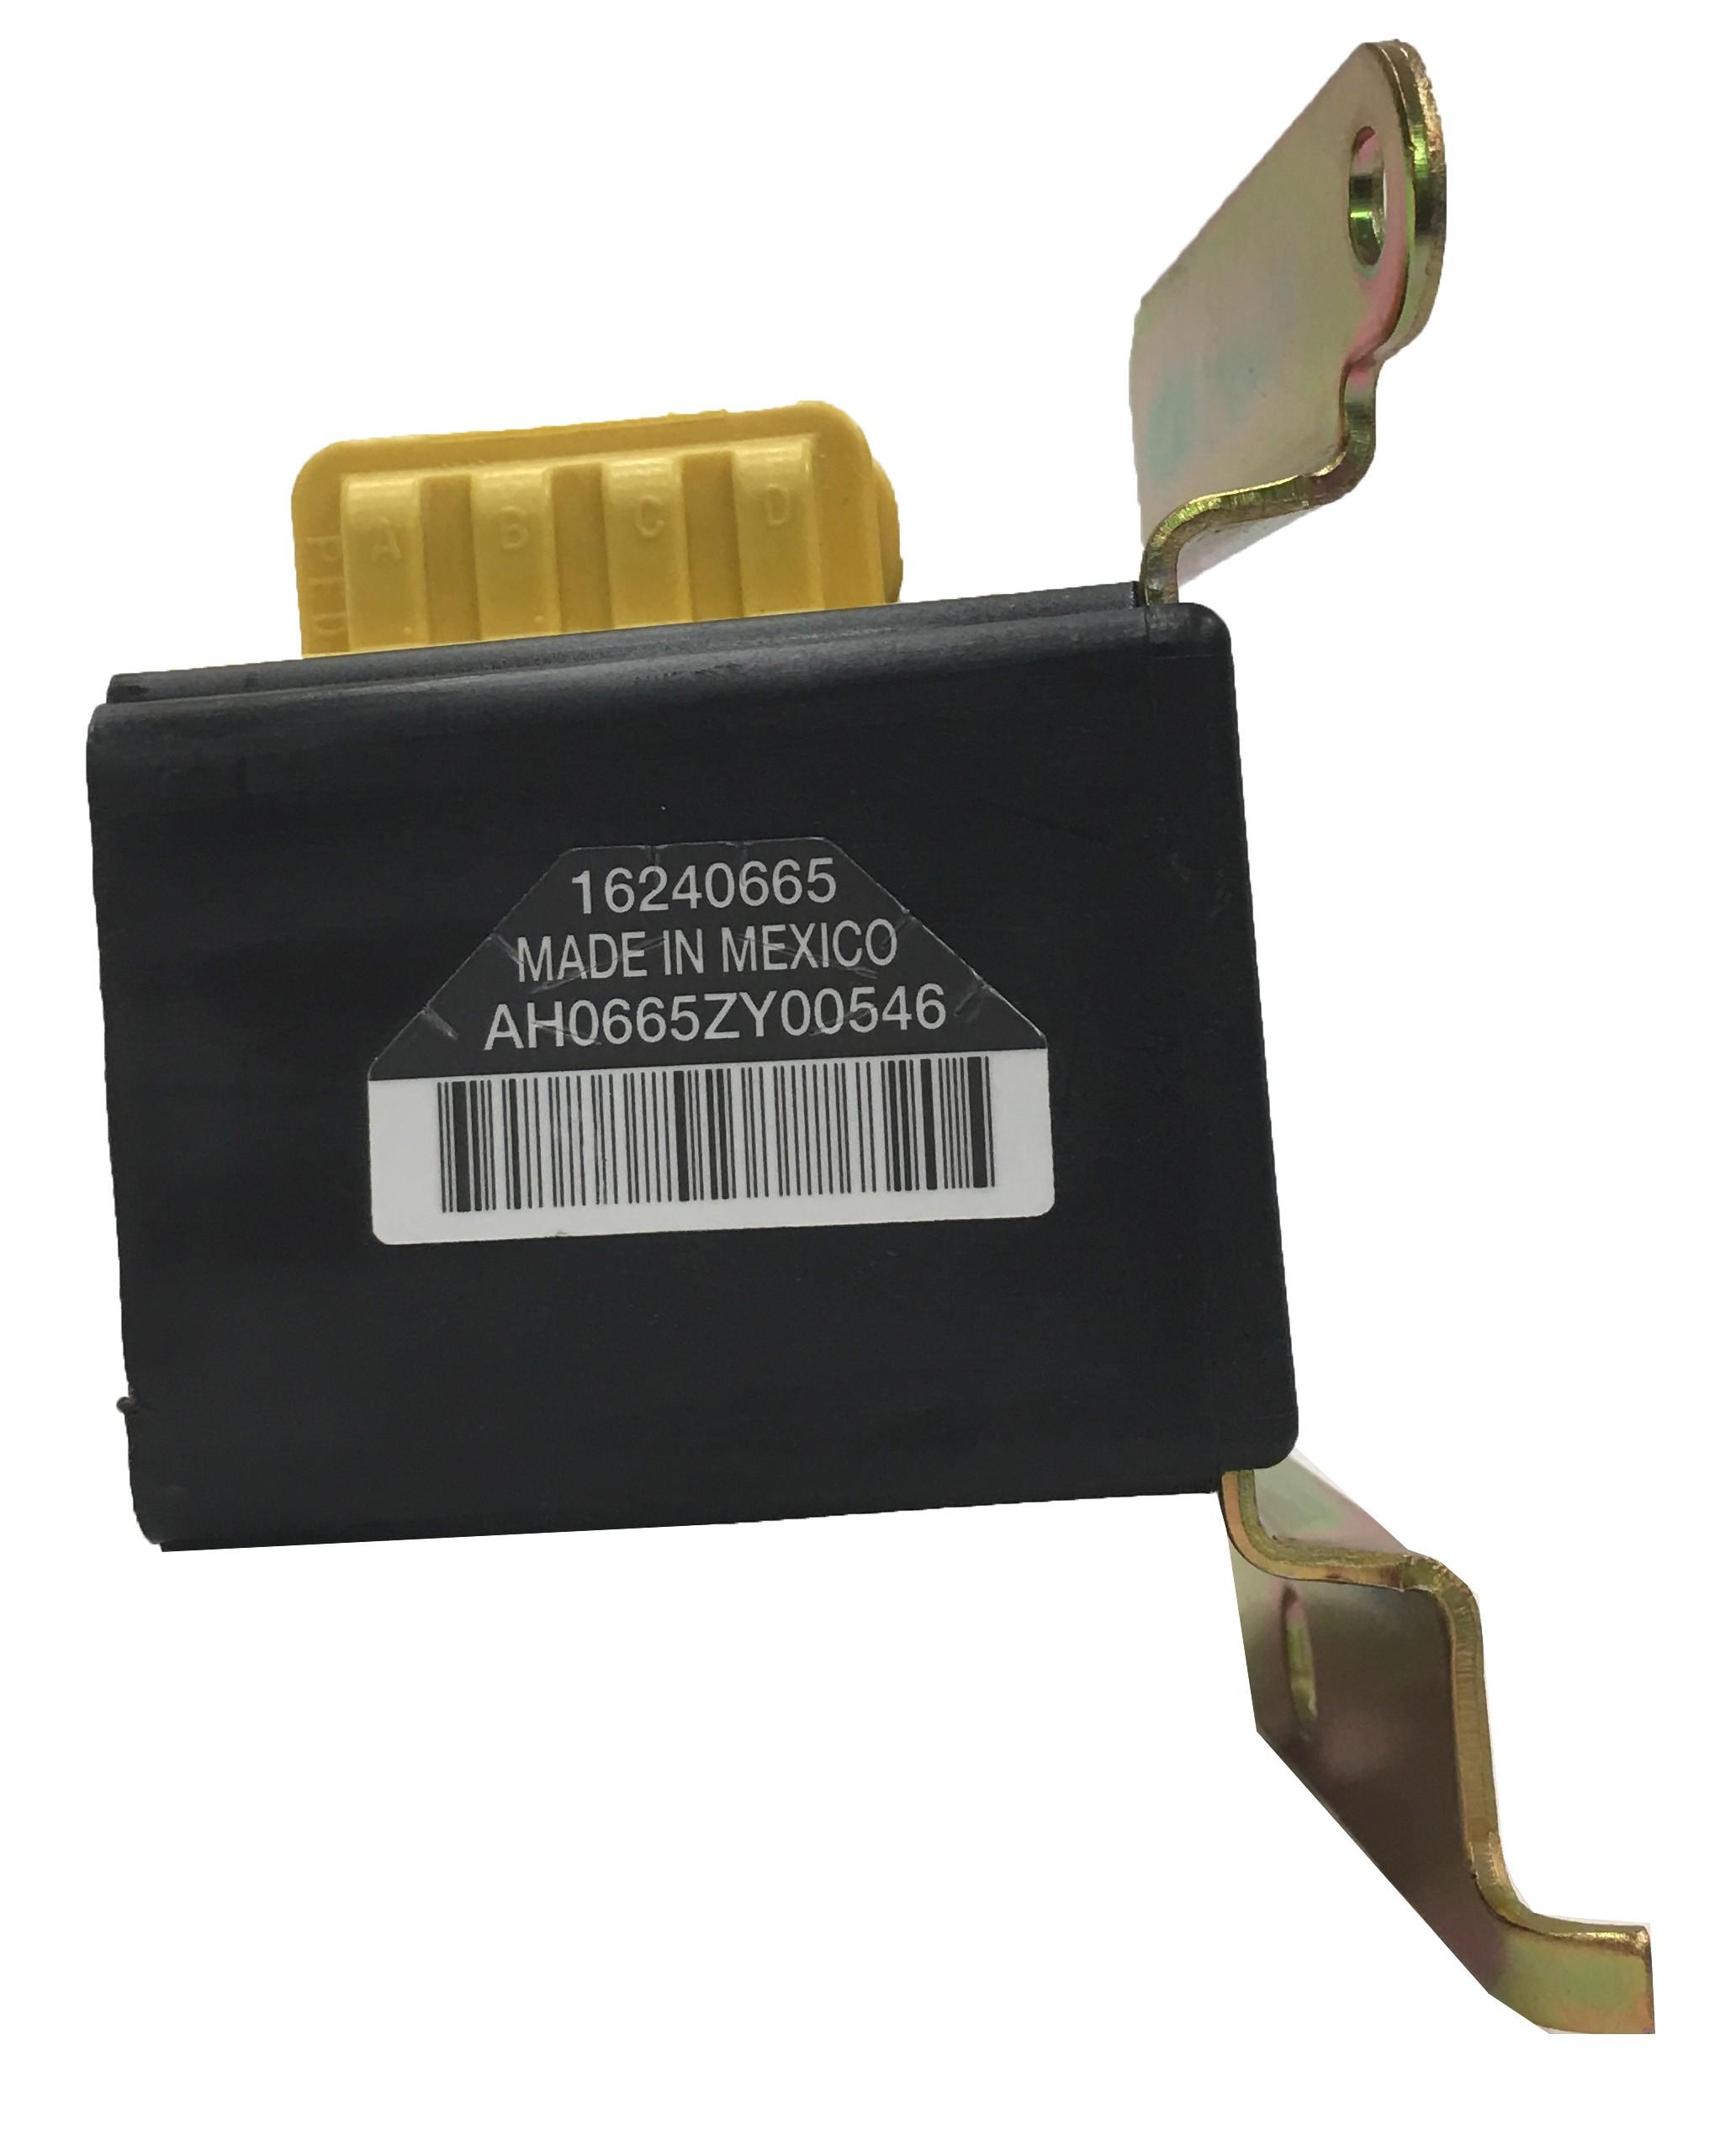 Oem Left Airbag Sensor 16240665 Fits Blazer S10 Jimmy